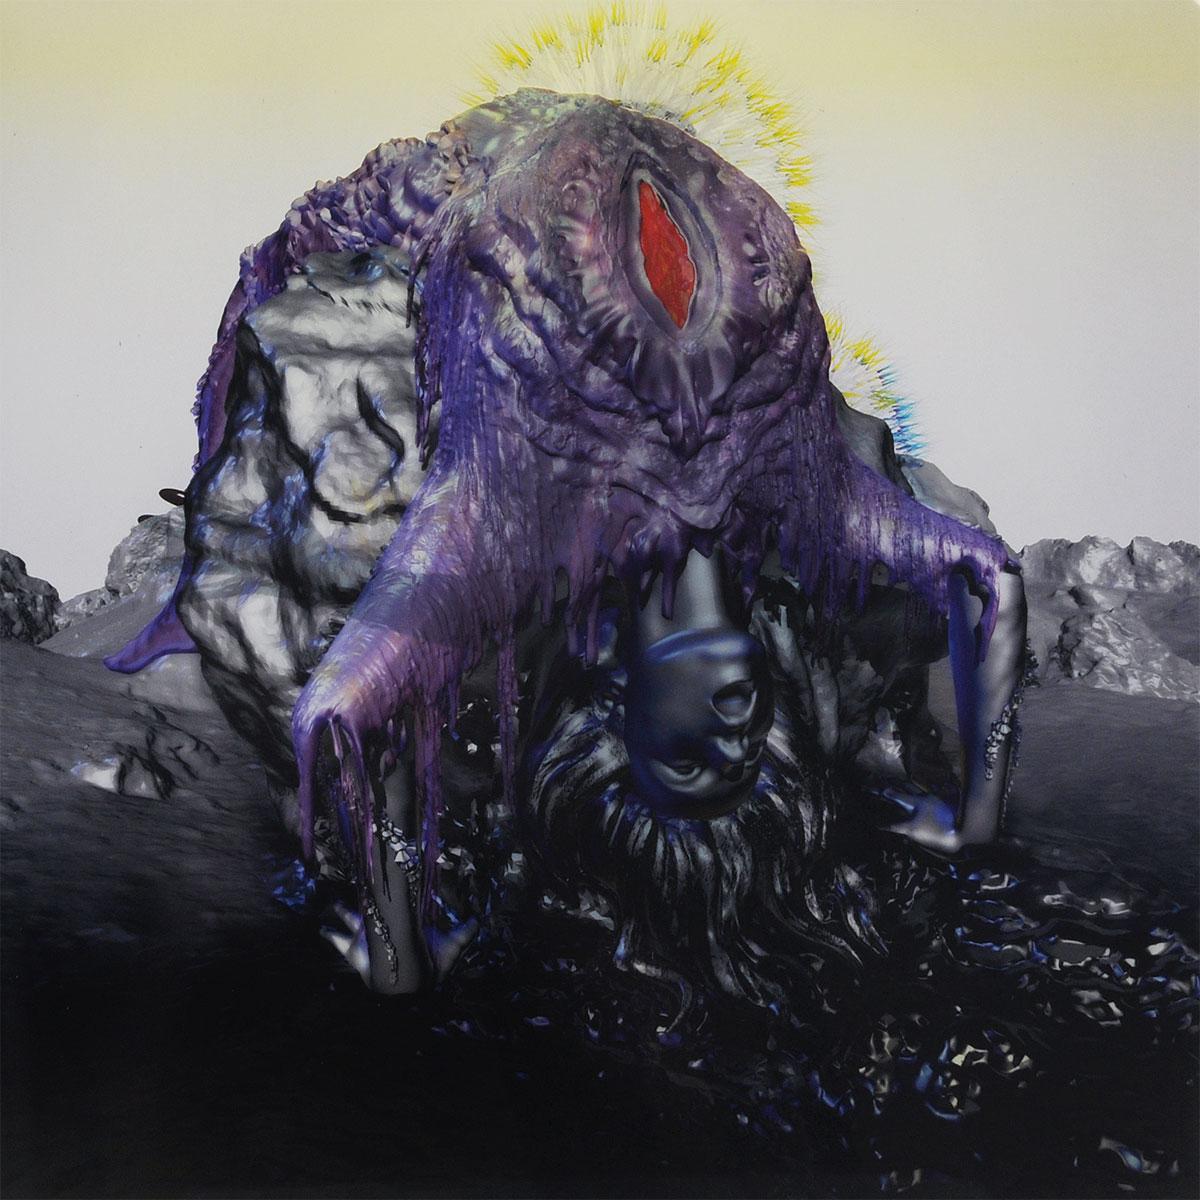 Бьорк Bjork. Vulnicura. Deluxe Edition (2 LP) marillion marillion radiation 2013 deluxe edition 2 lp